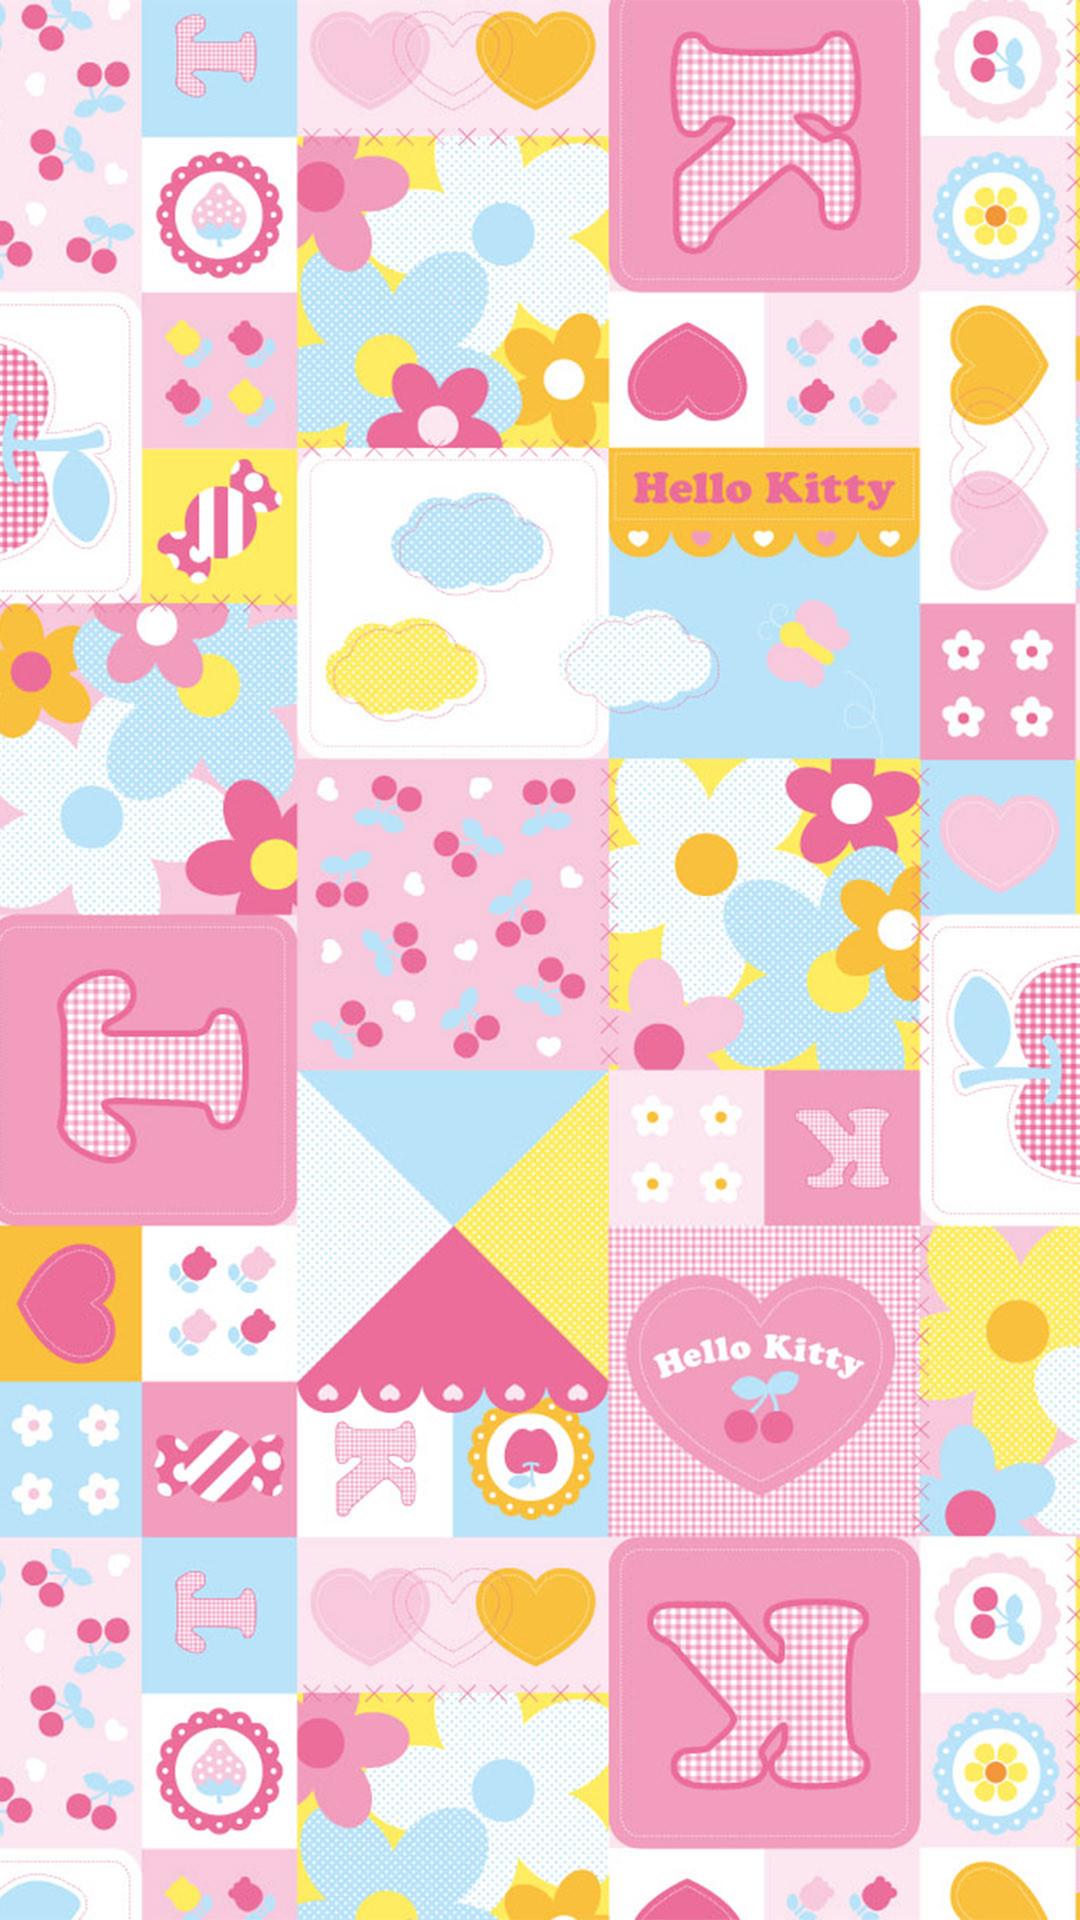 "Girly cute iPhone wallpaper. """